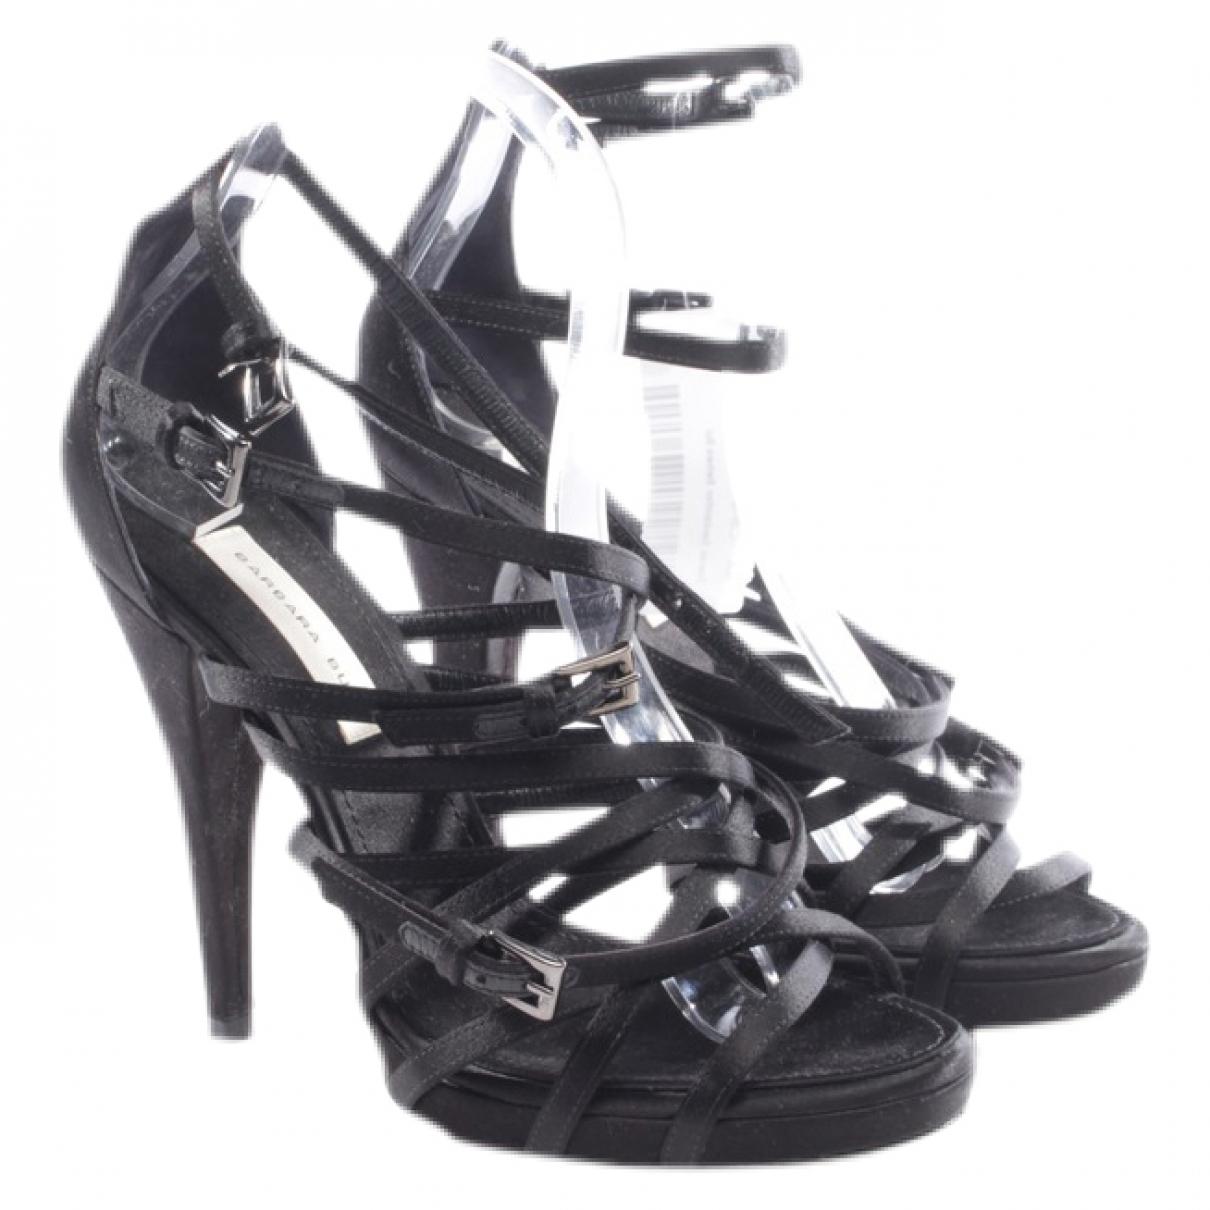 Barbara Bui \N Black Leather Sandals for Women 37 EU